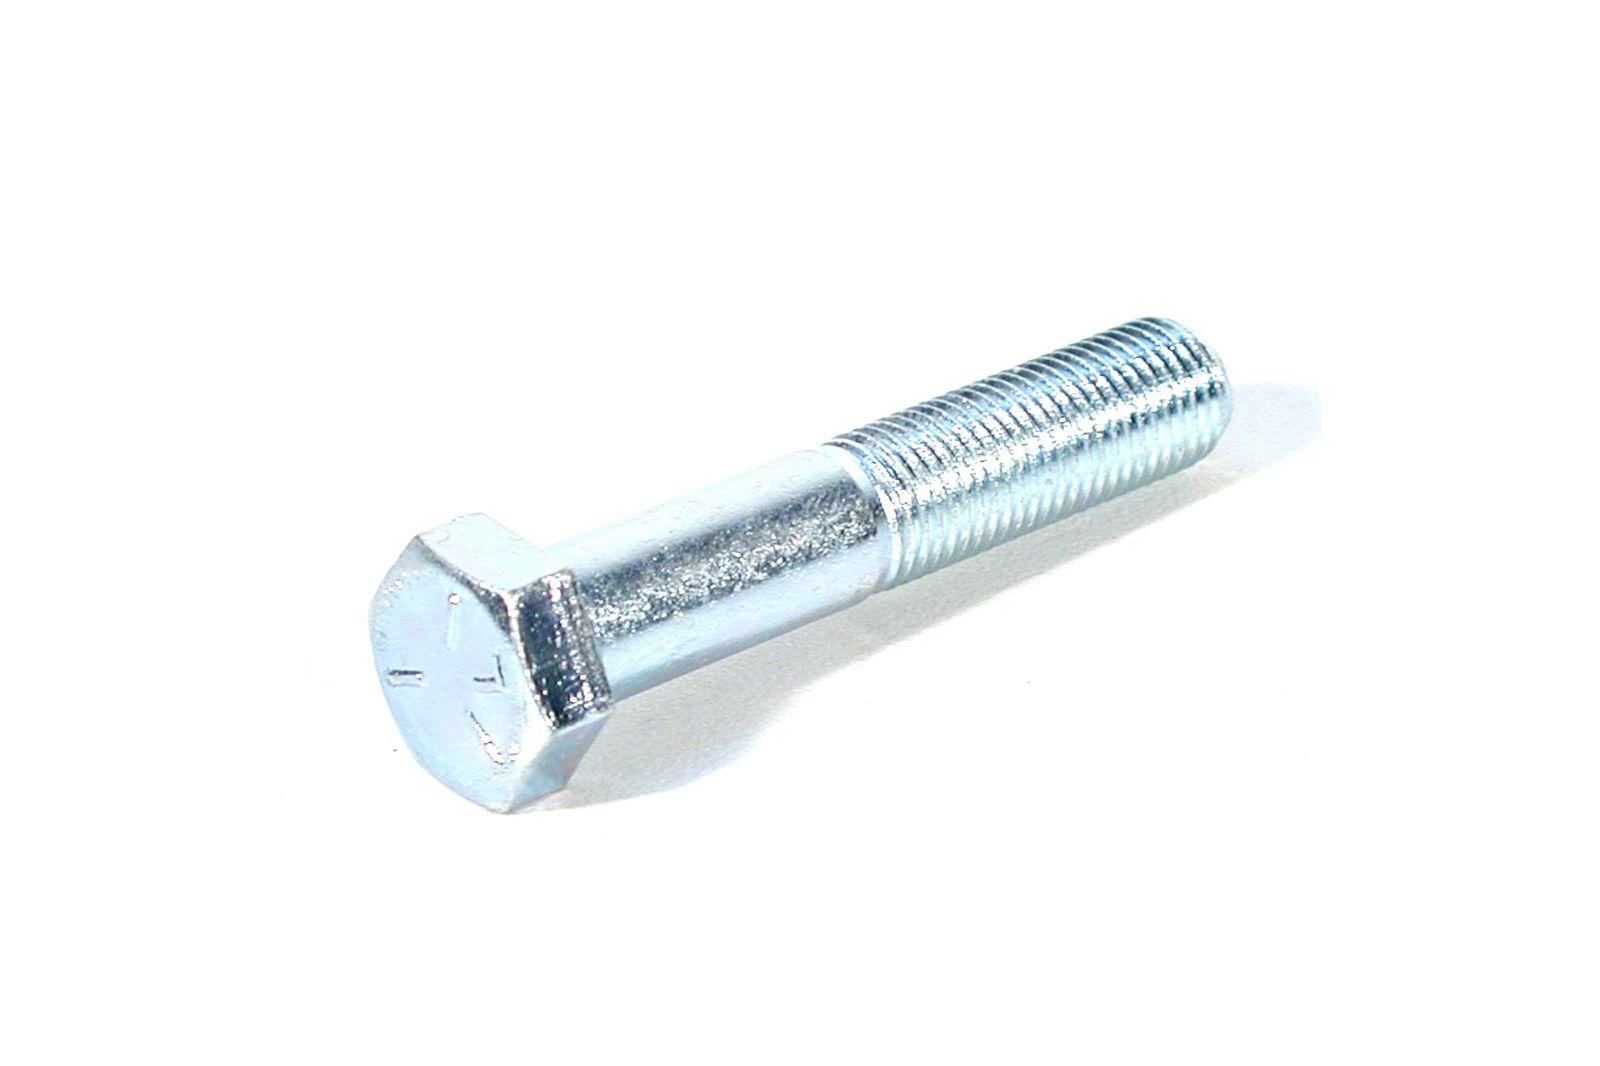 "#1002-40 Bolzen UNF 3/8"" x 2"" (2x), BH606161|2"